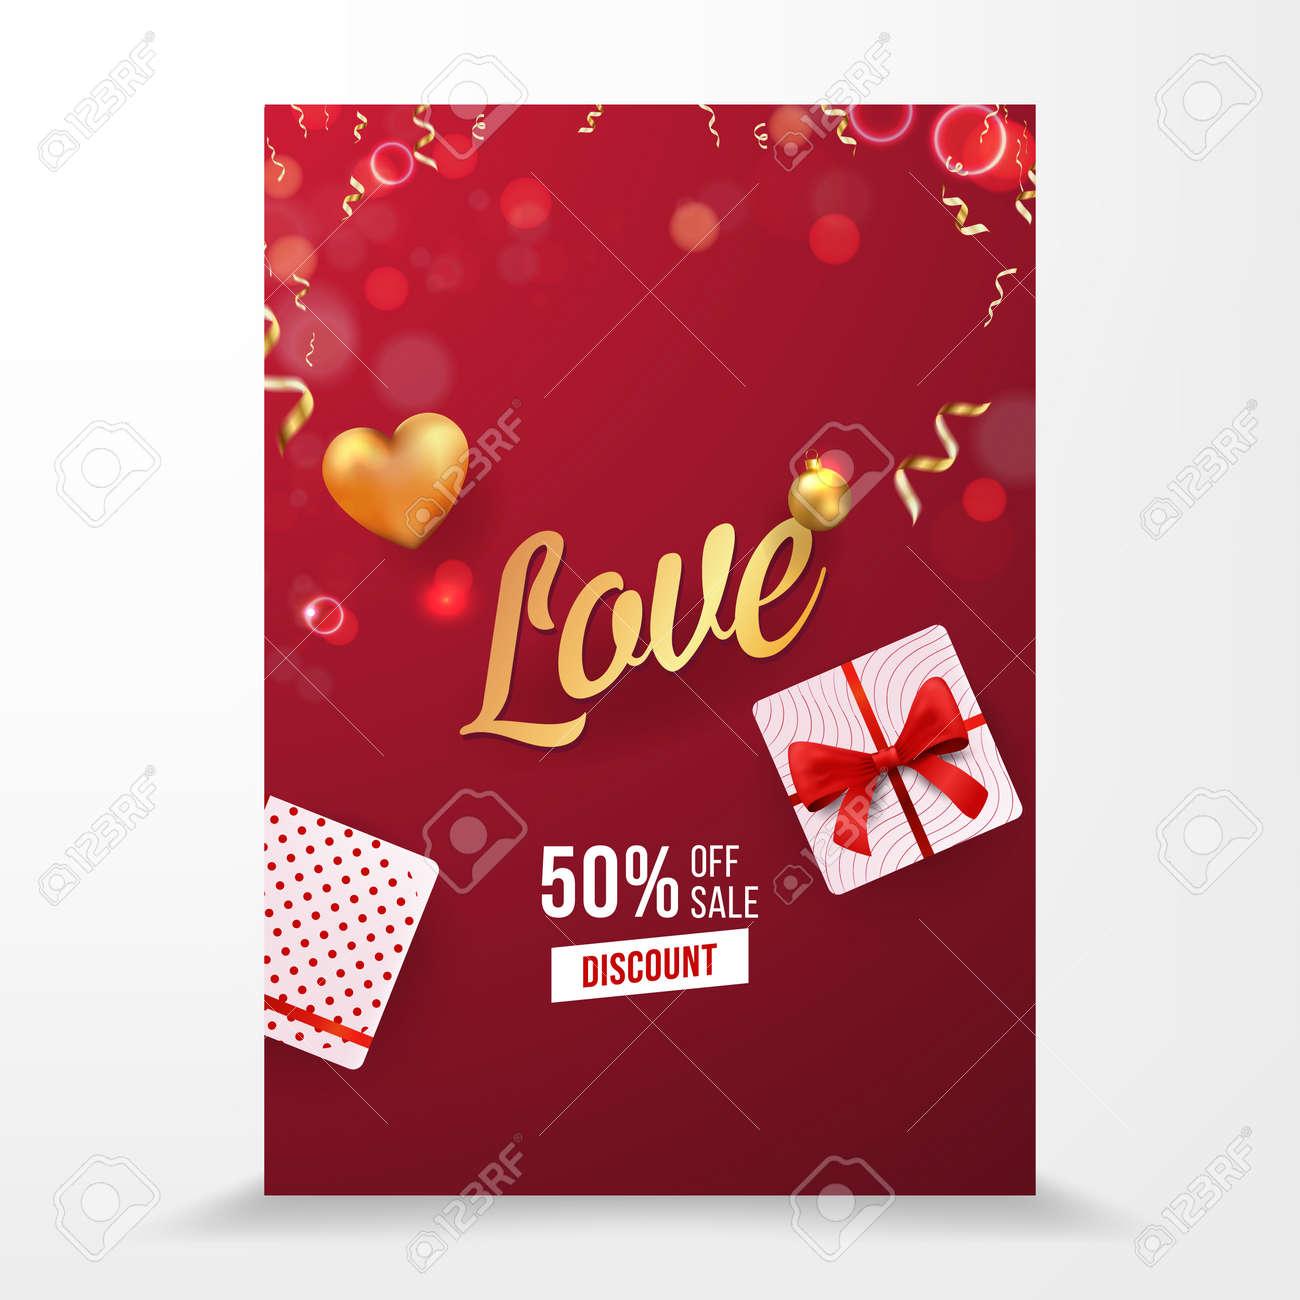 Love Vector Selling Brochure Template Design - 164379036